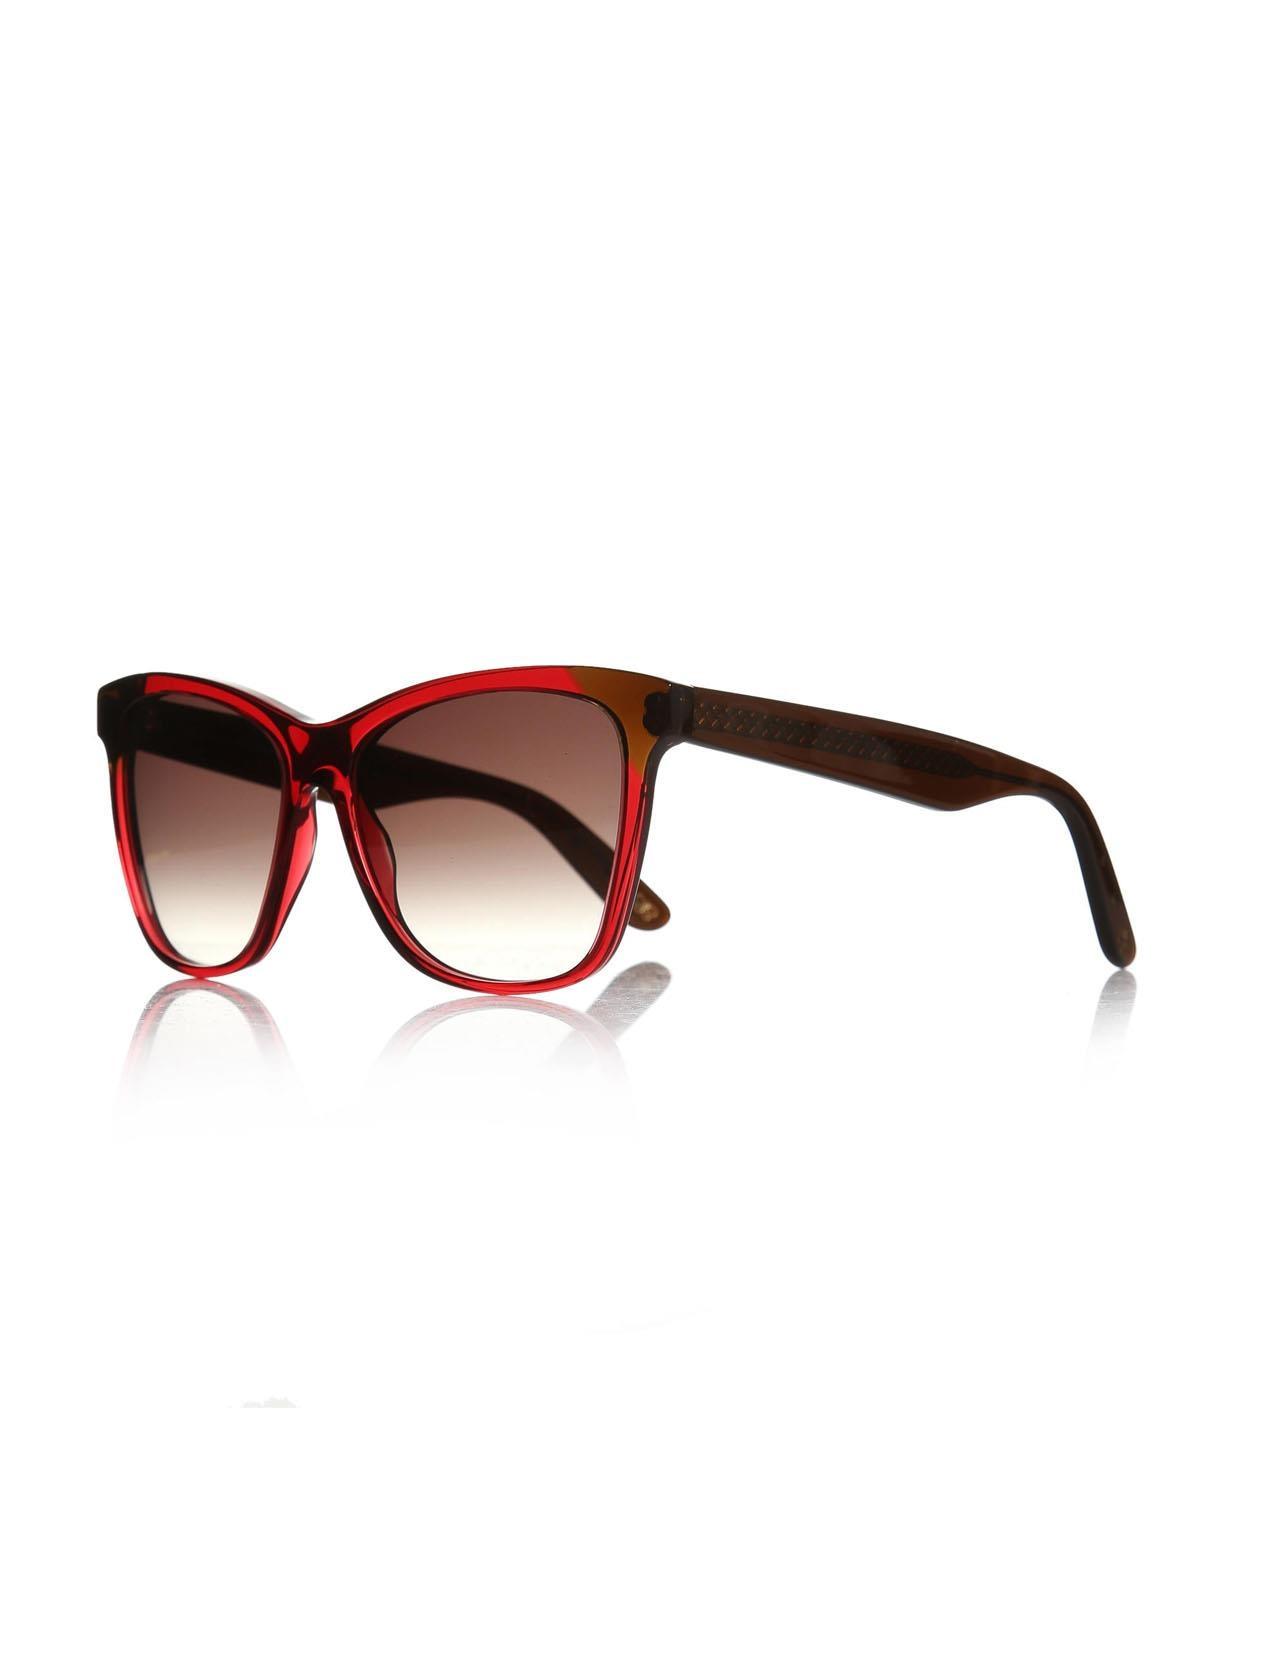 Женские солнцезащитные очки b.v 265/s 4cp 55 js bone Burgundy organic square 55-16-140 bottega veneta